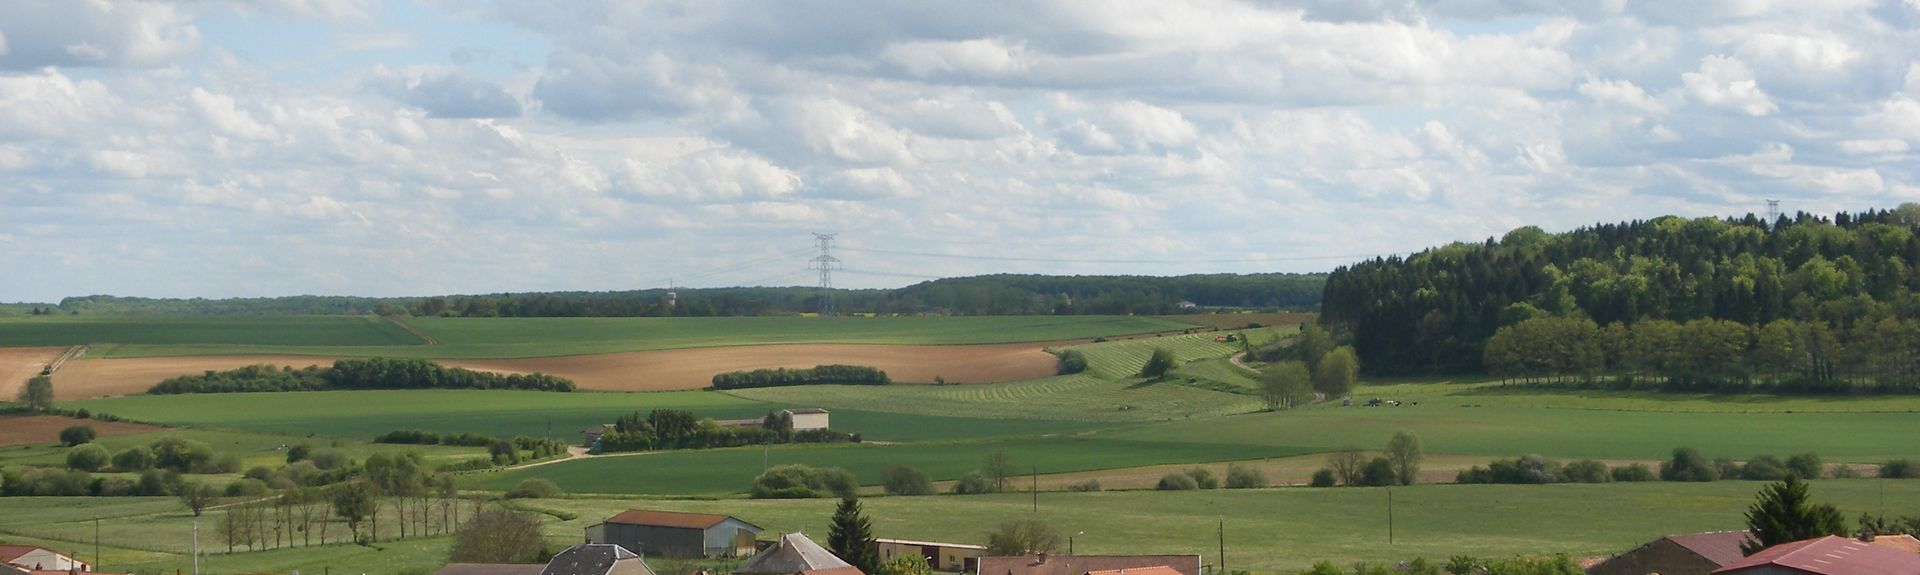 Montmédy, France